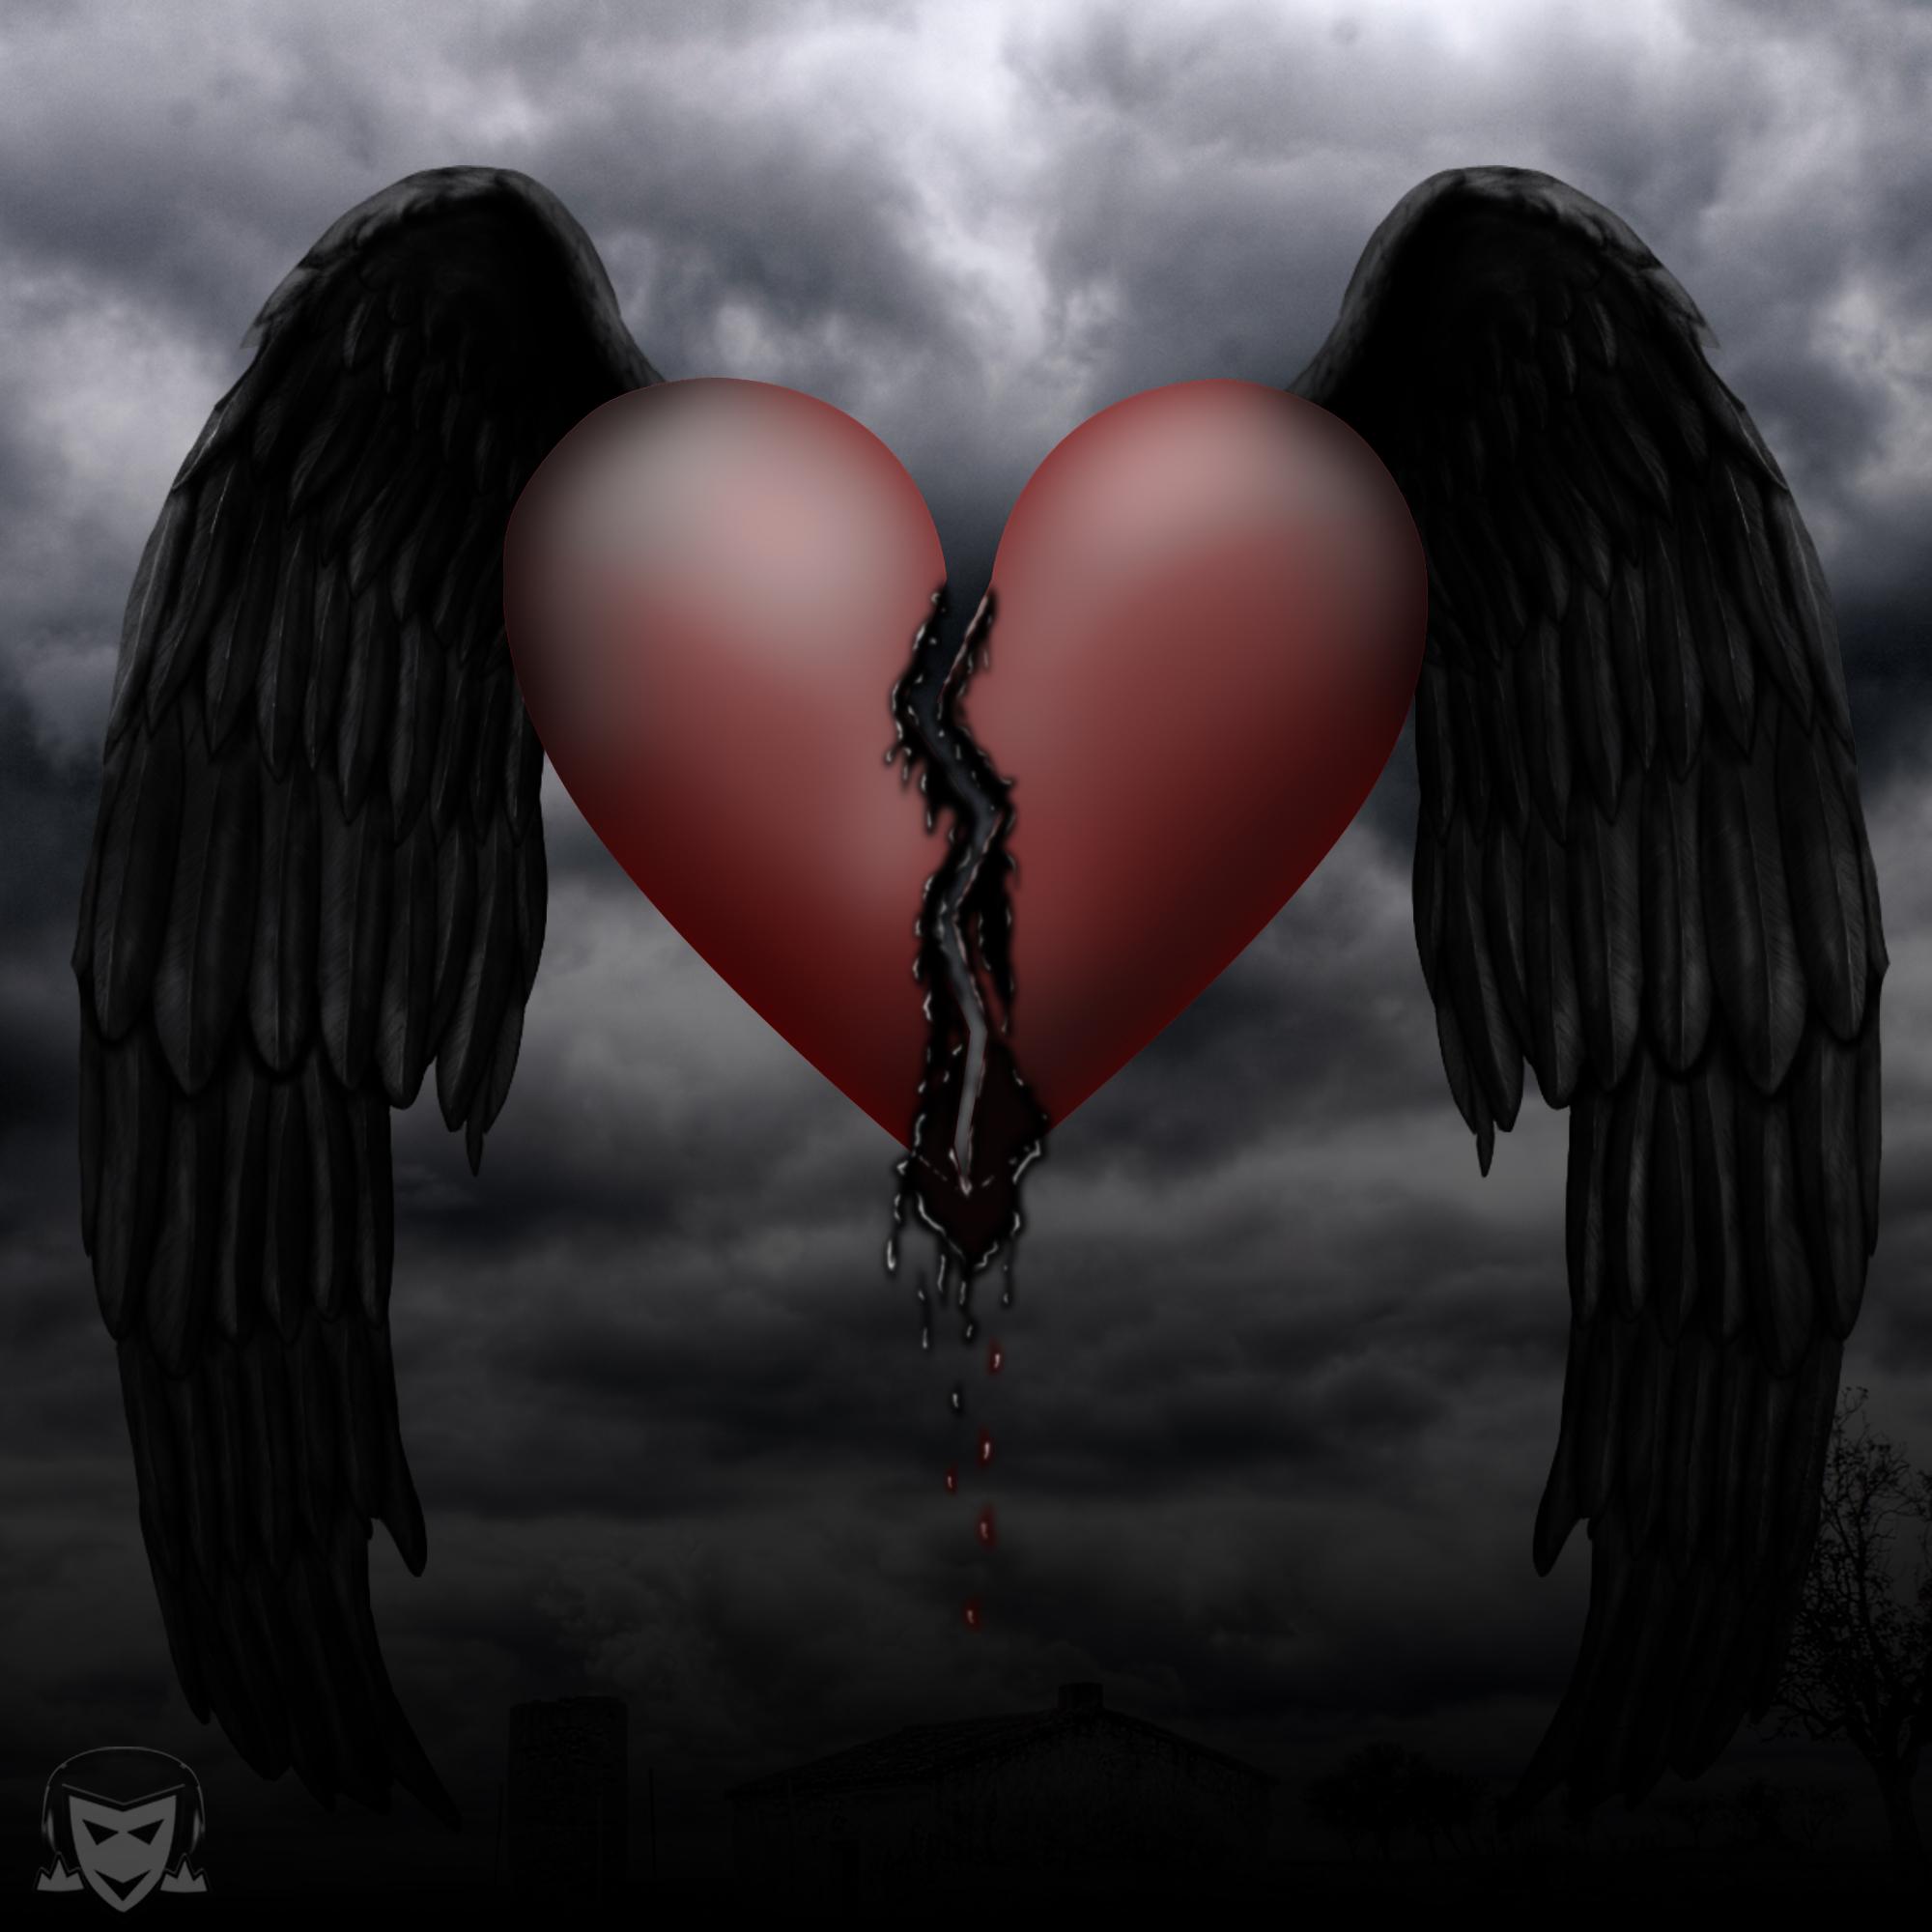 Dark heart by szopian on DeviantArt